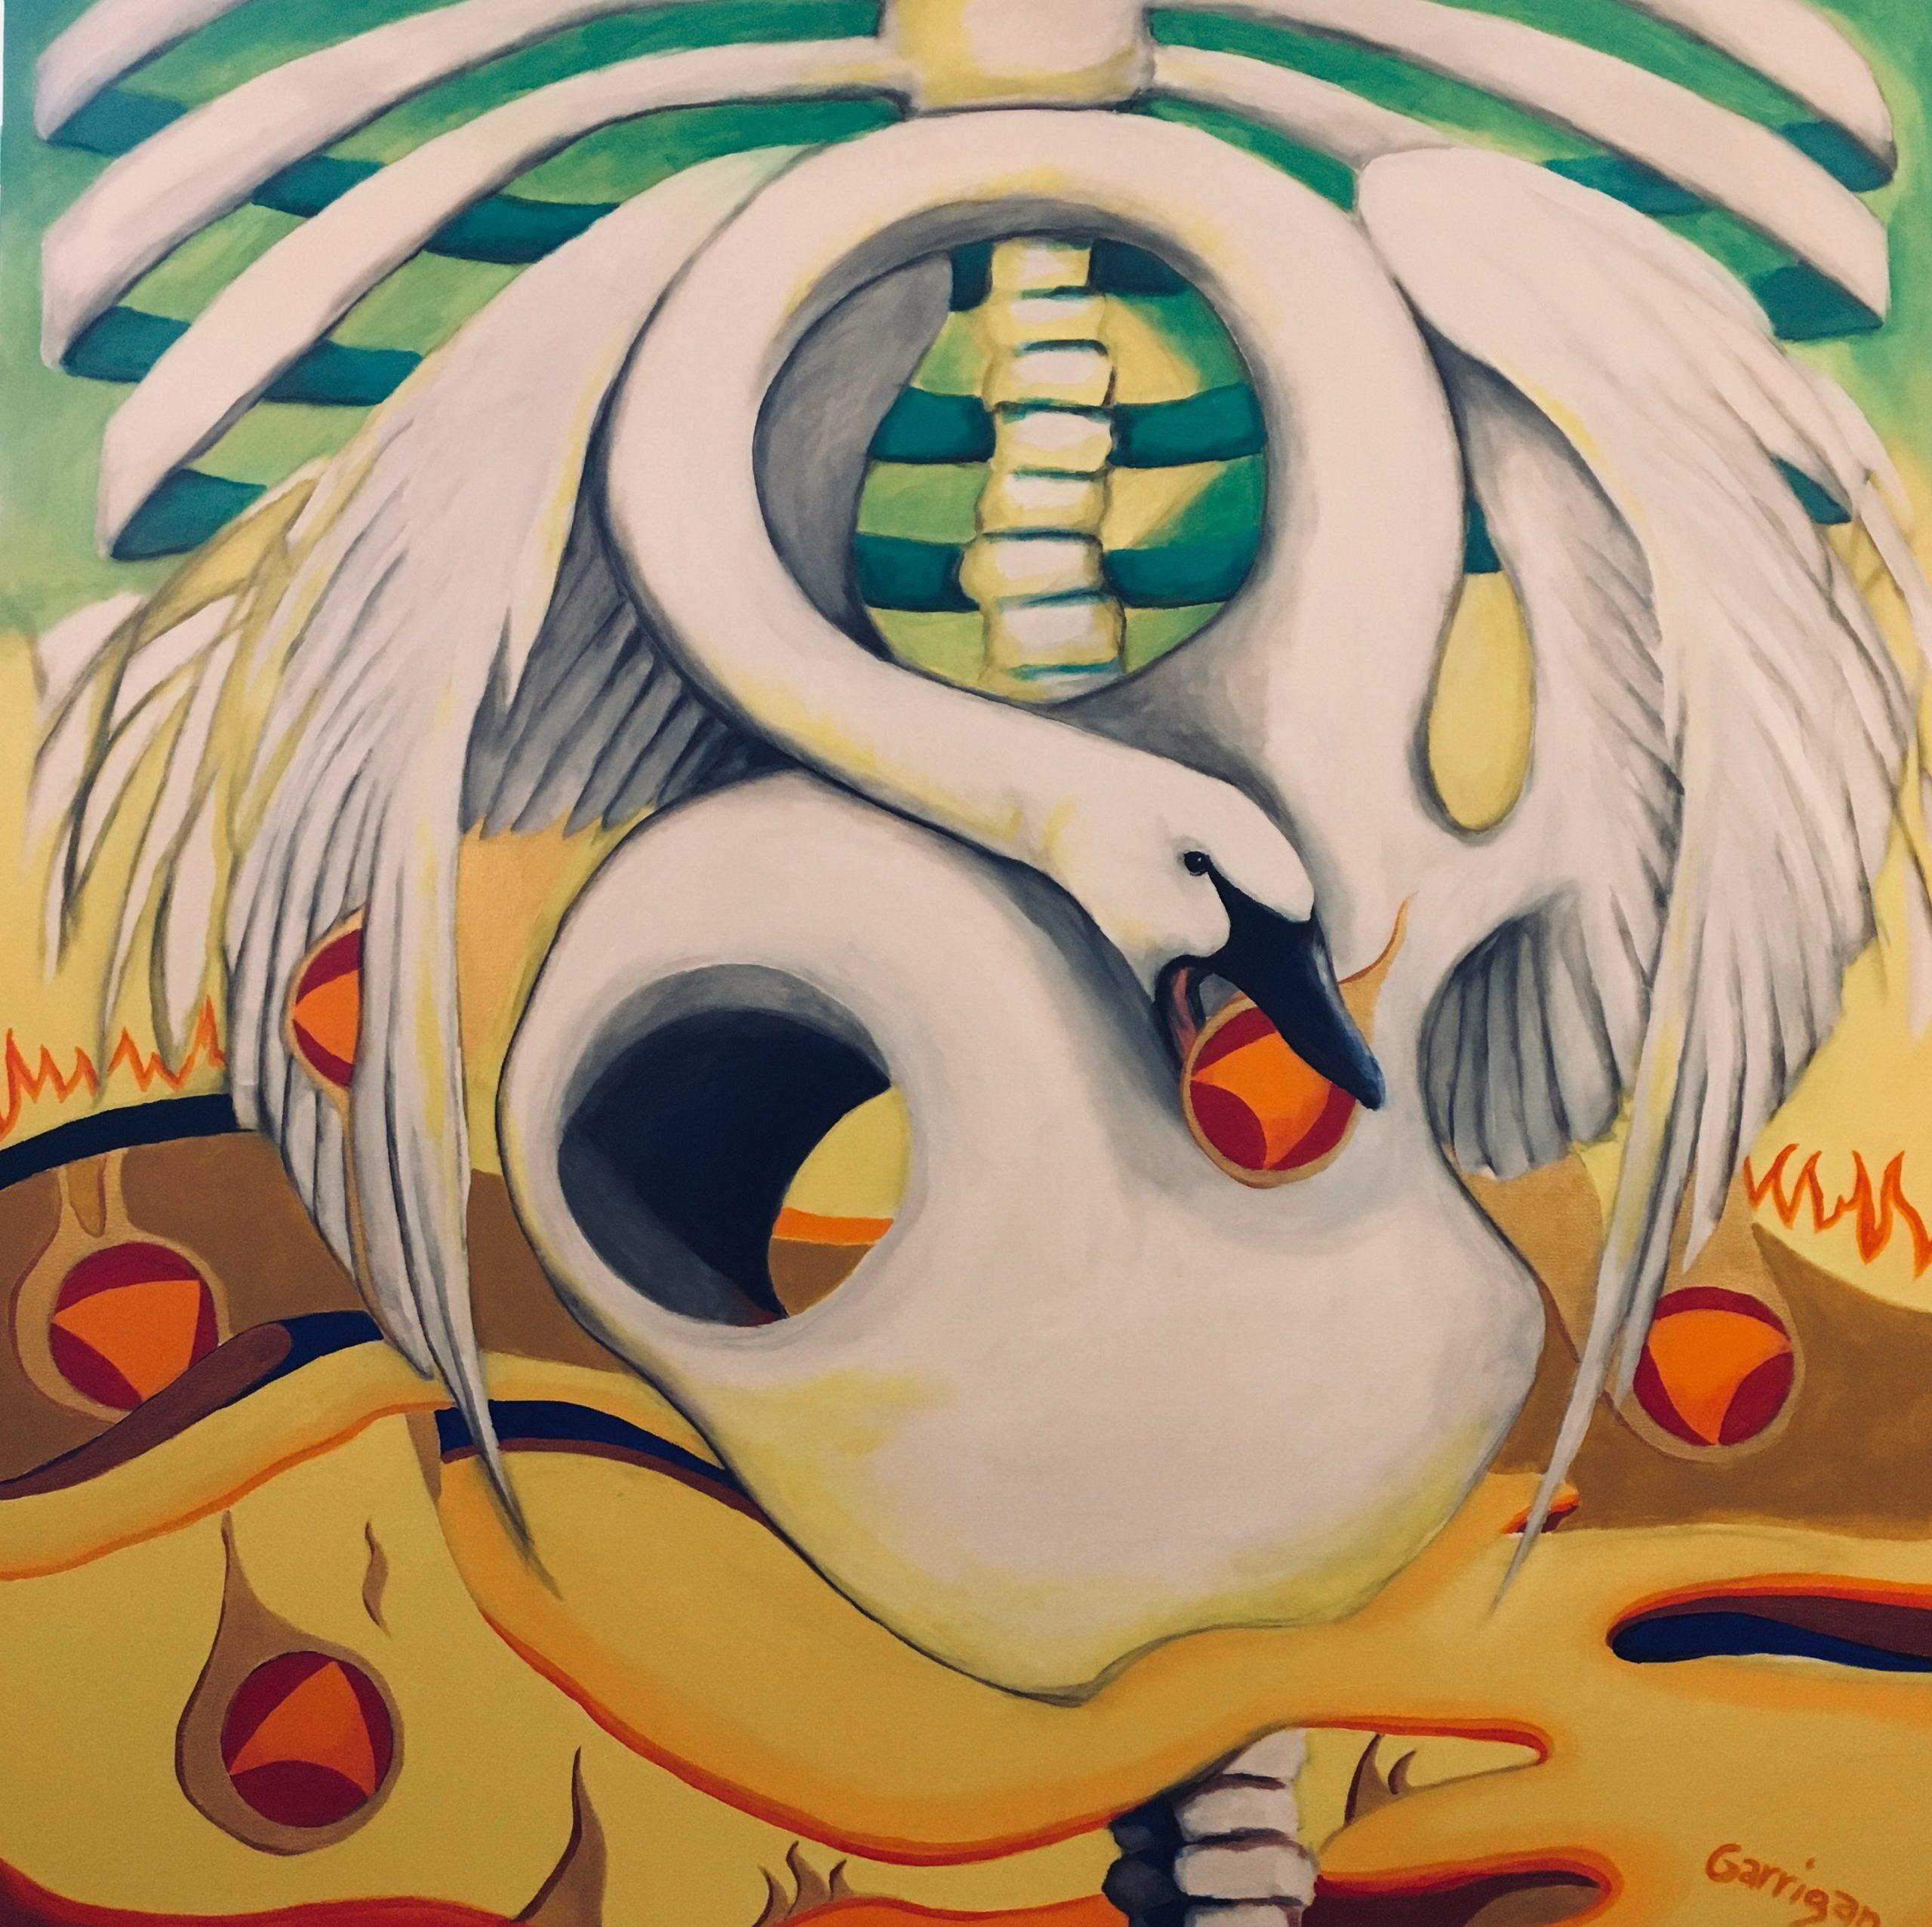 Anxiety Chakra Series #3 Solar Plexus Swan Song 2020 Garrigan